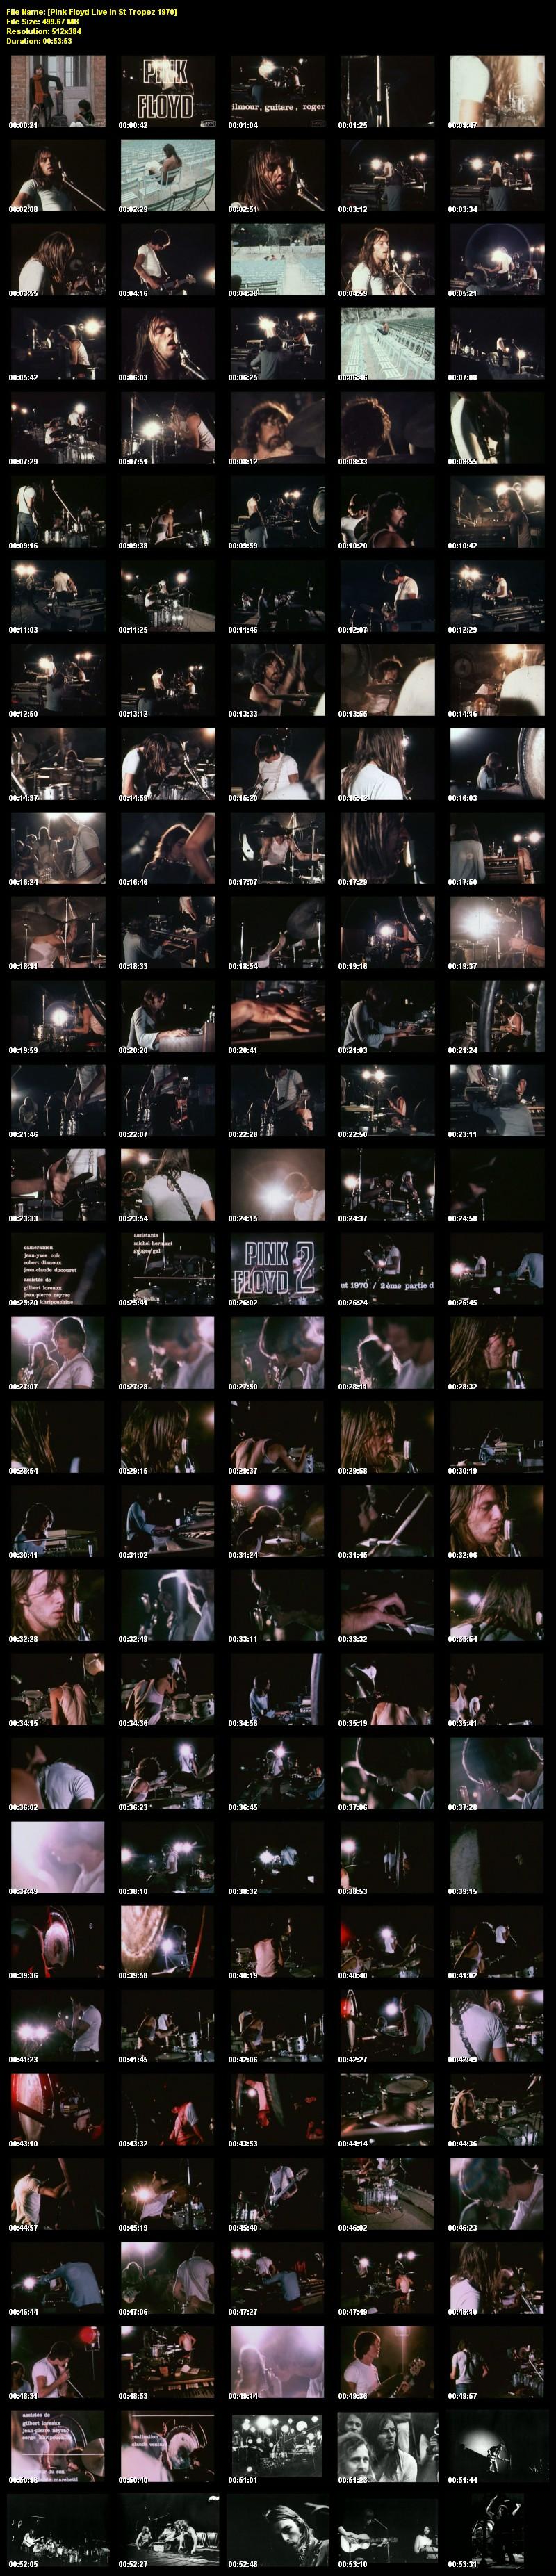 89076_Pink_Floyd_Live_in_St_Tropez_1970_122_685lo.jpg